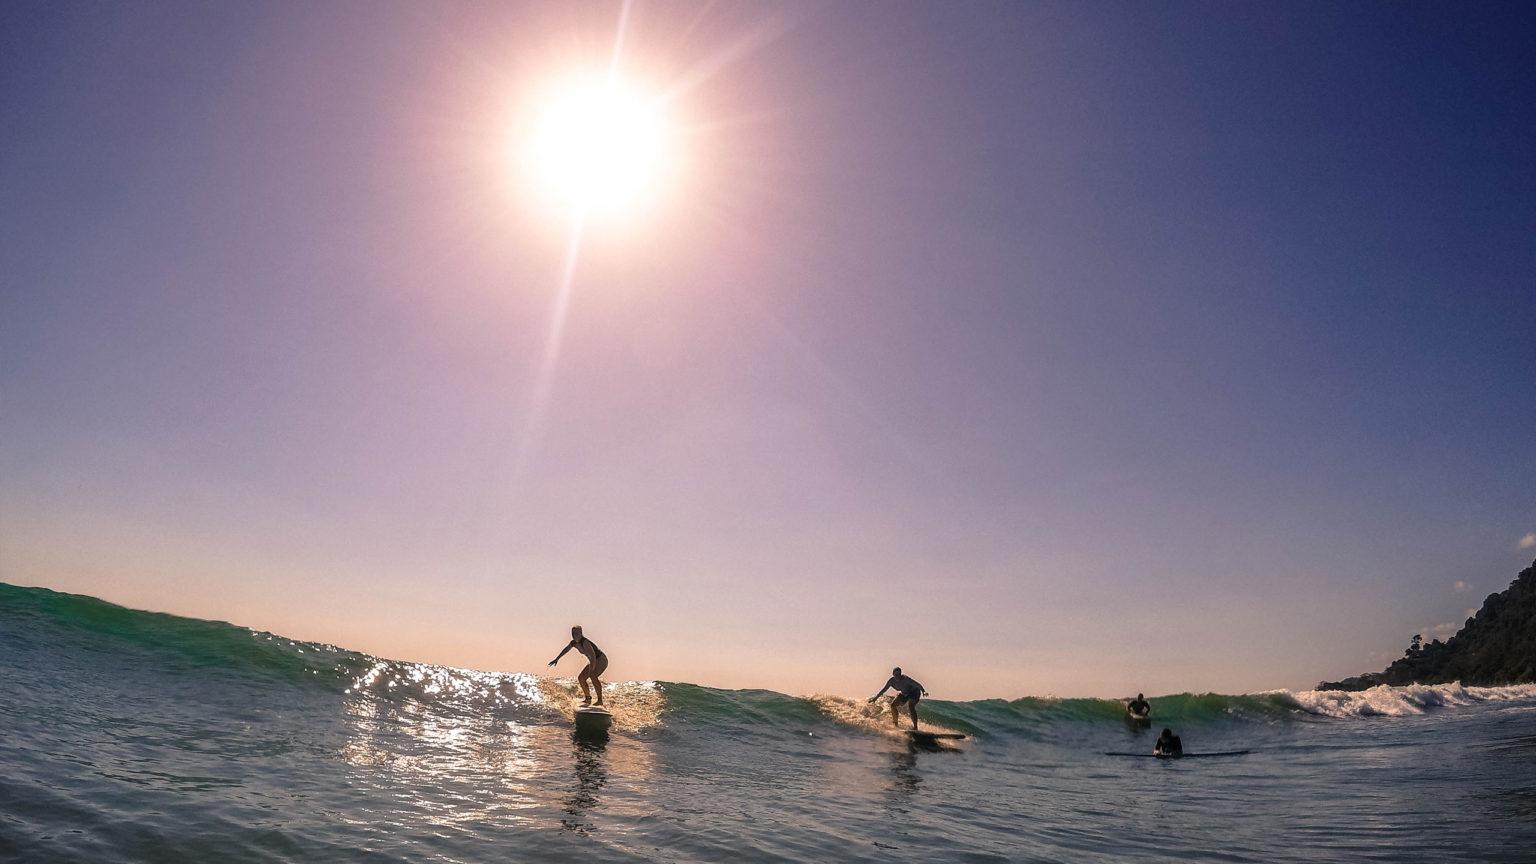 Kalon Surf Costa Rica Sunset Waves